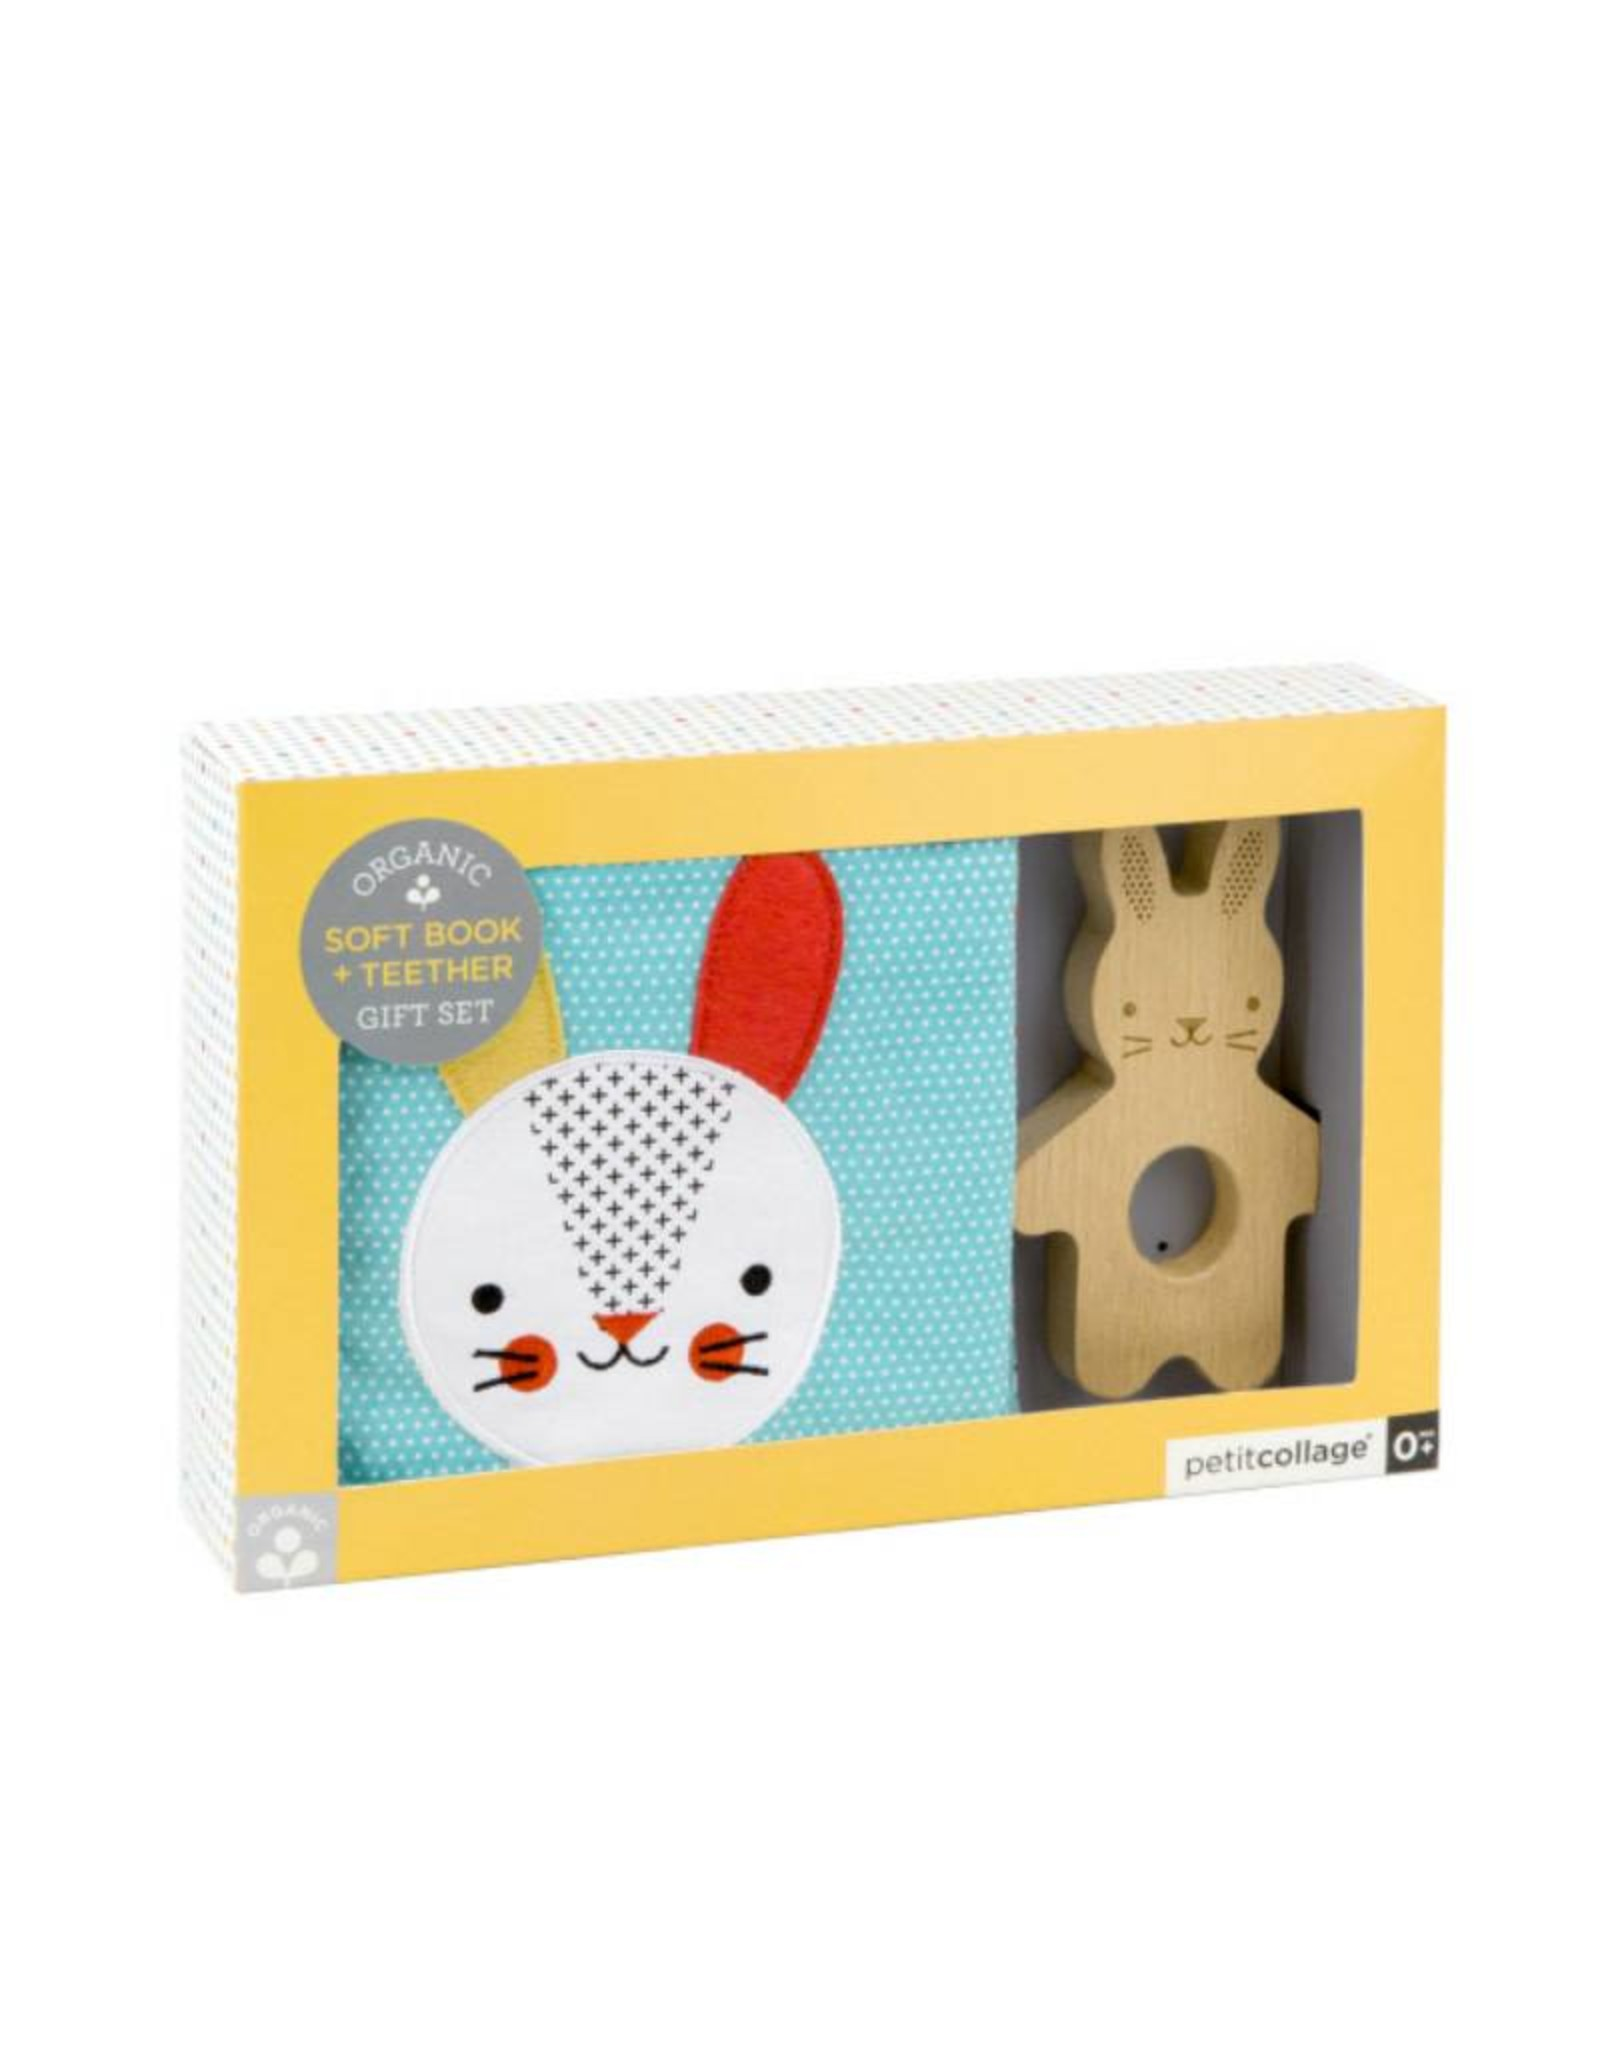 Petit Collage Organic soft book + Teether set 0+